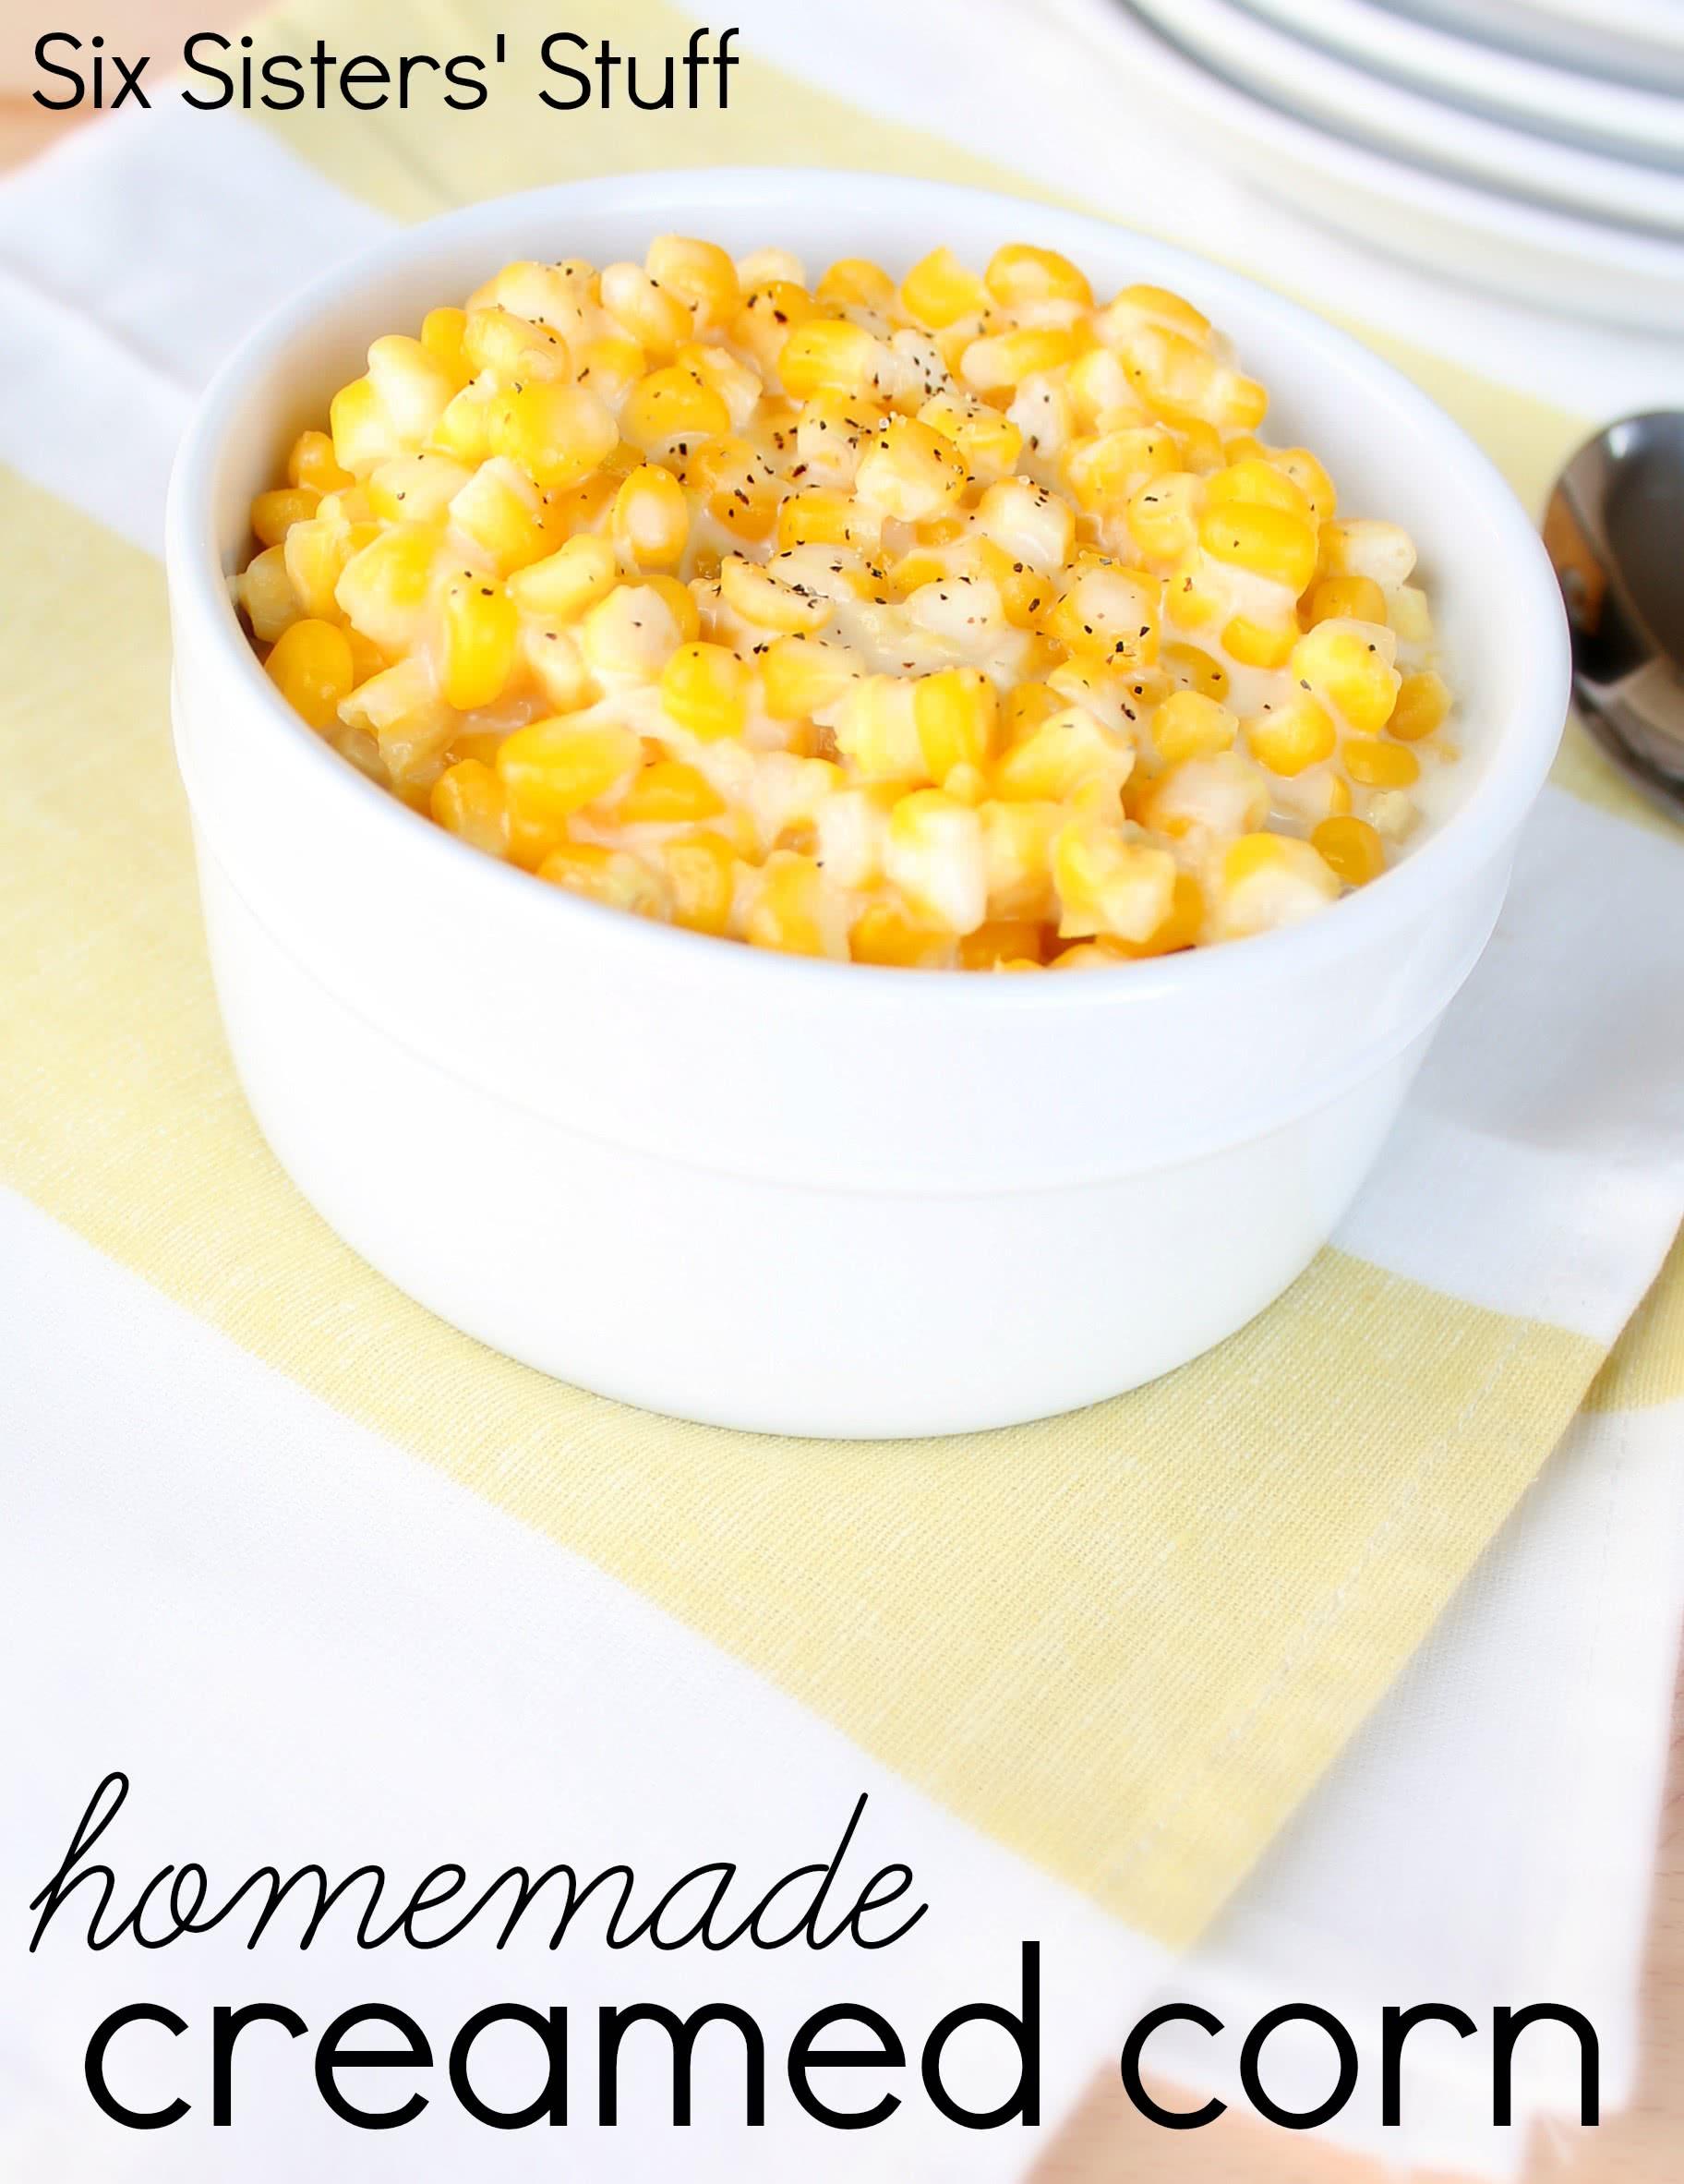 homemade-creamed-corn-recipe